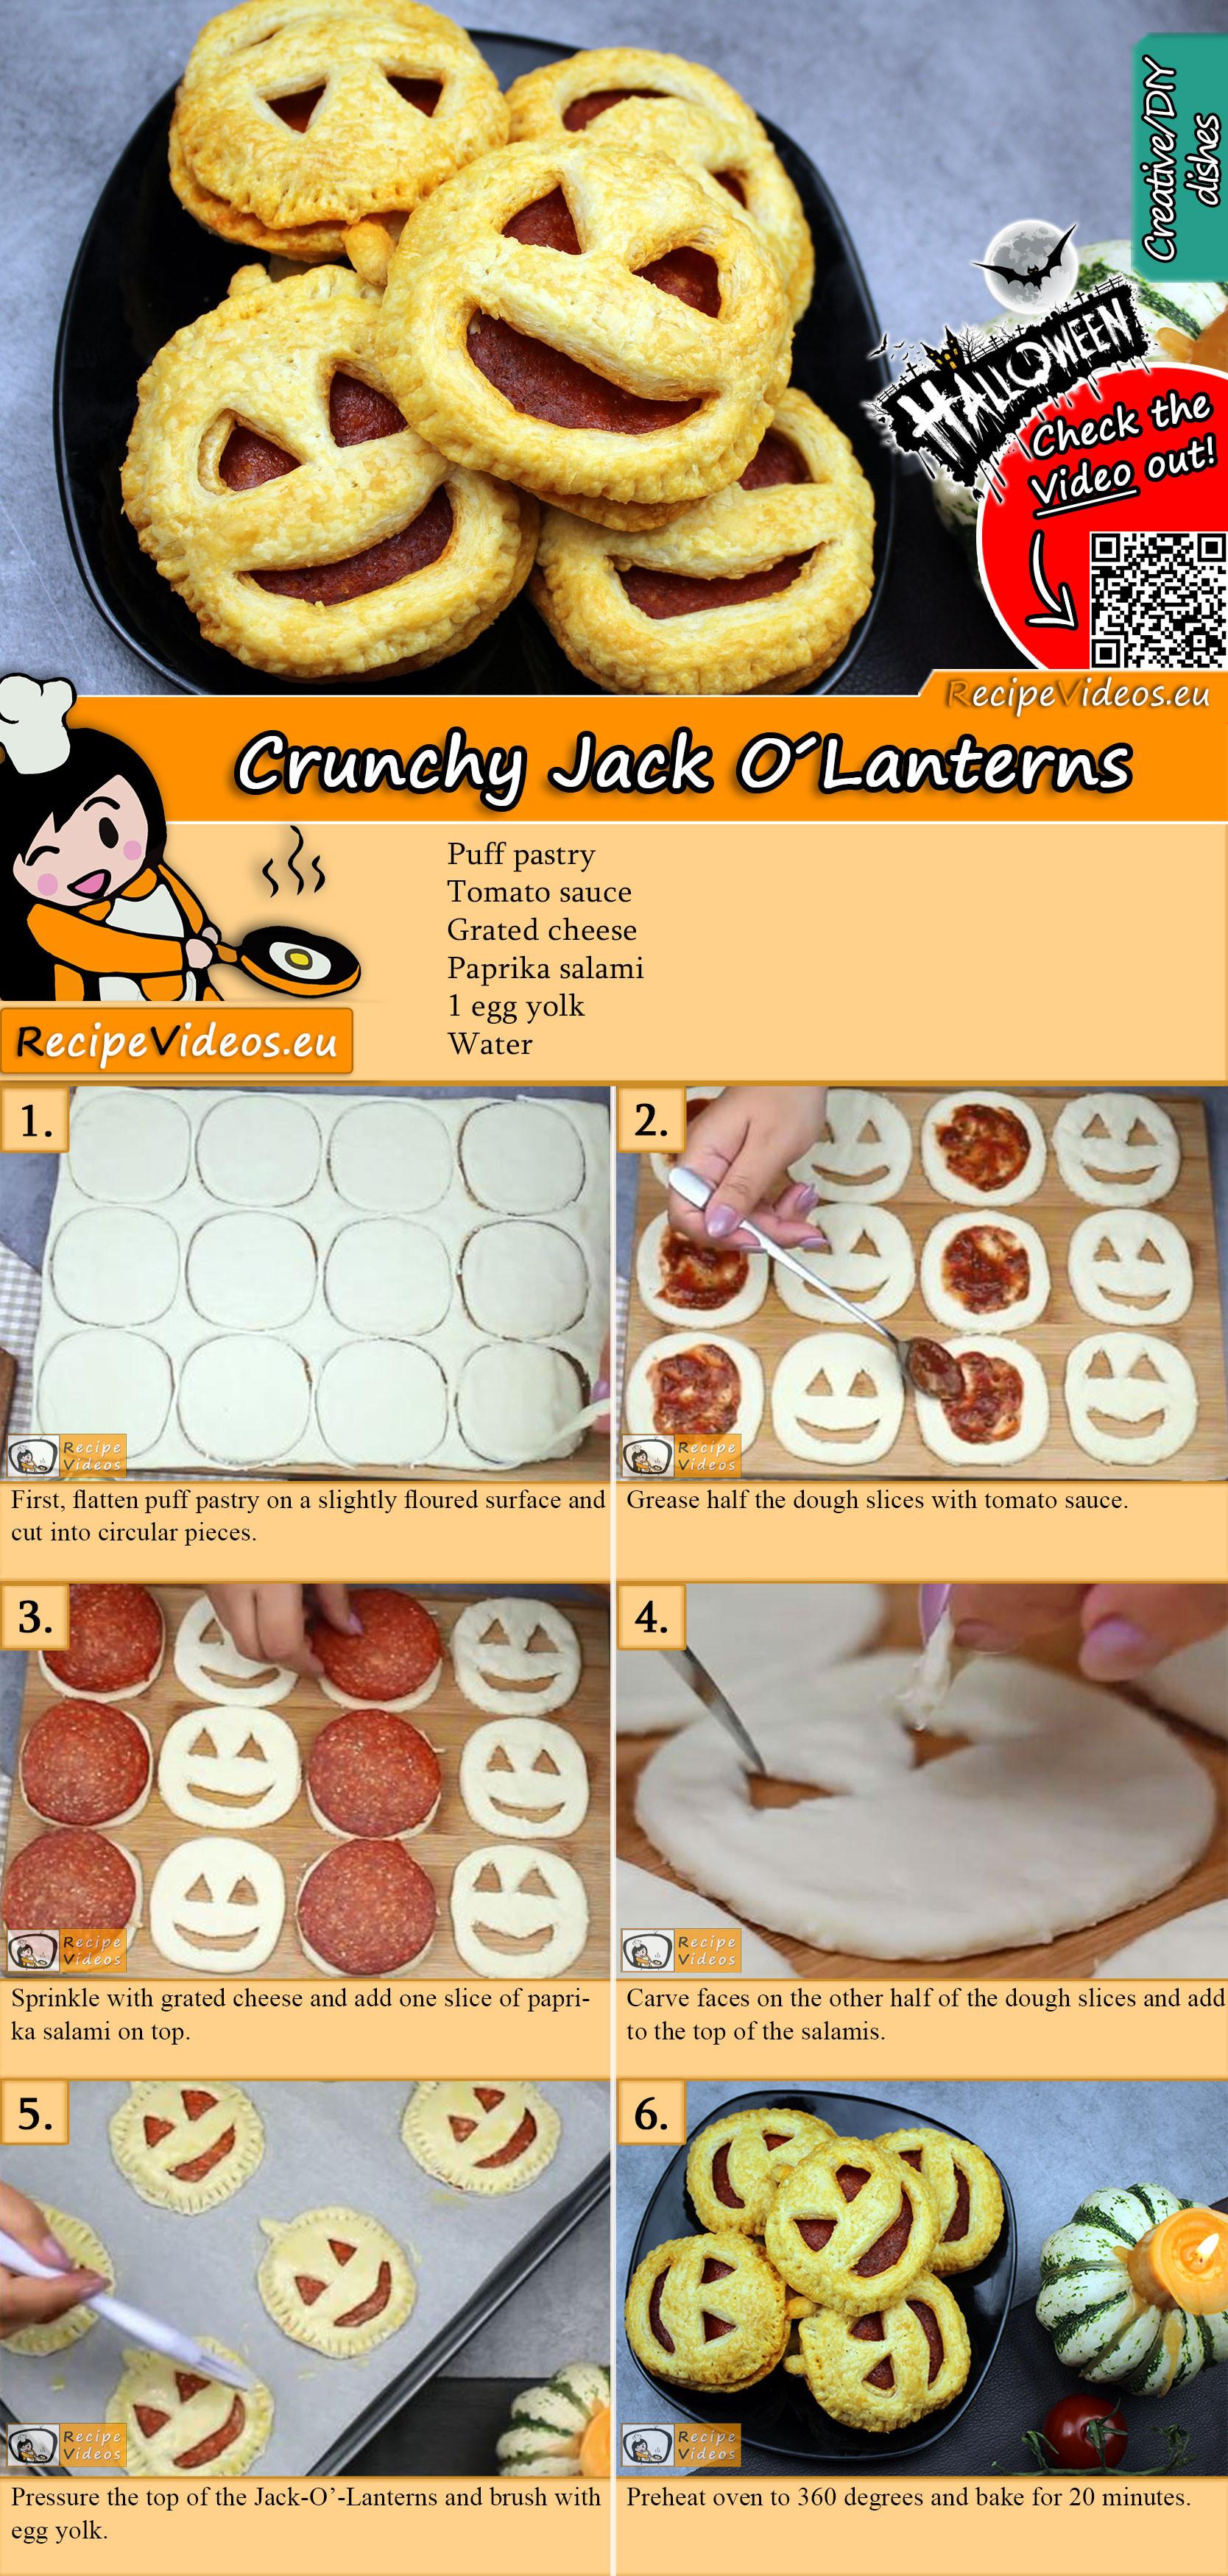 Crunchy Jack-O'-Lanterns recipe with video